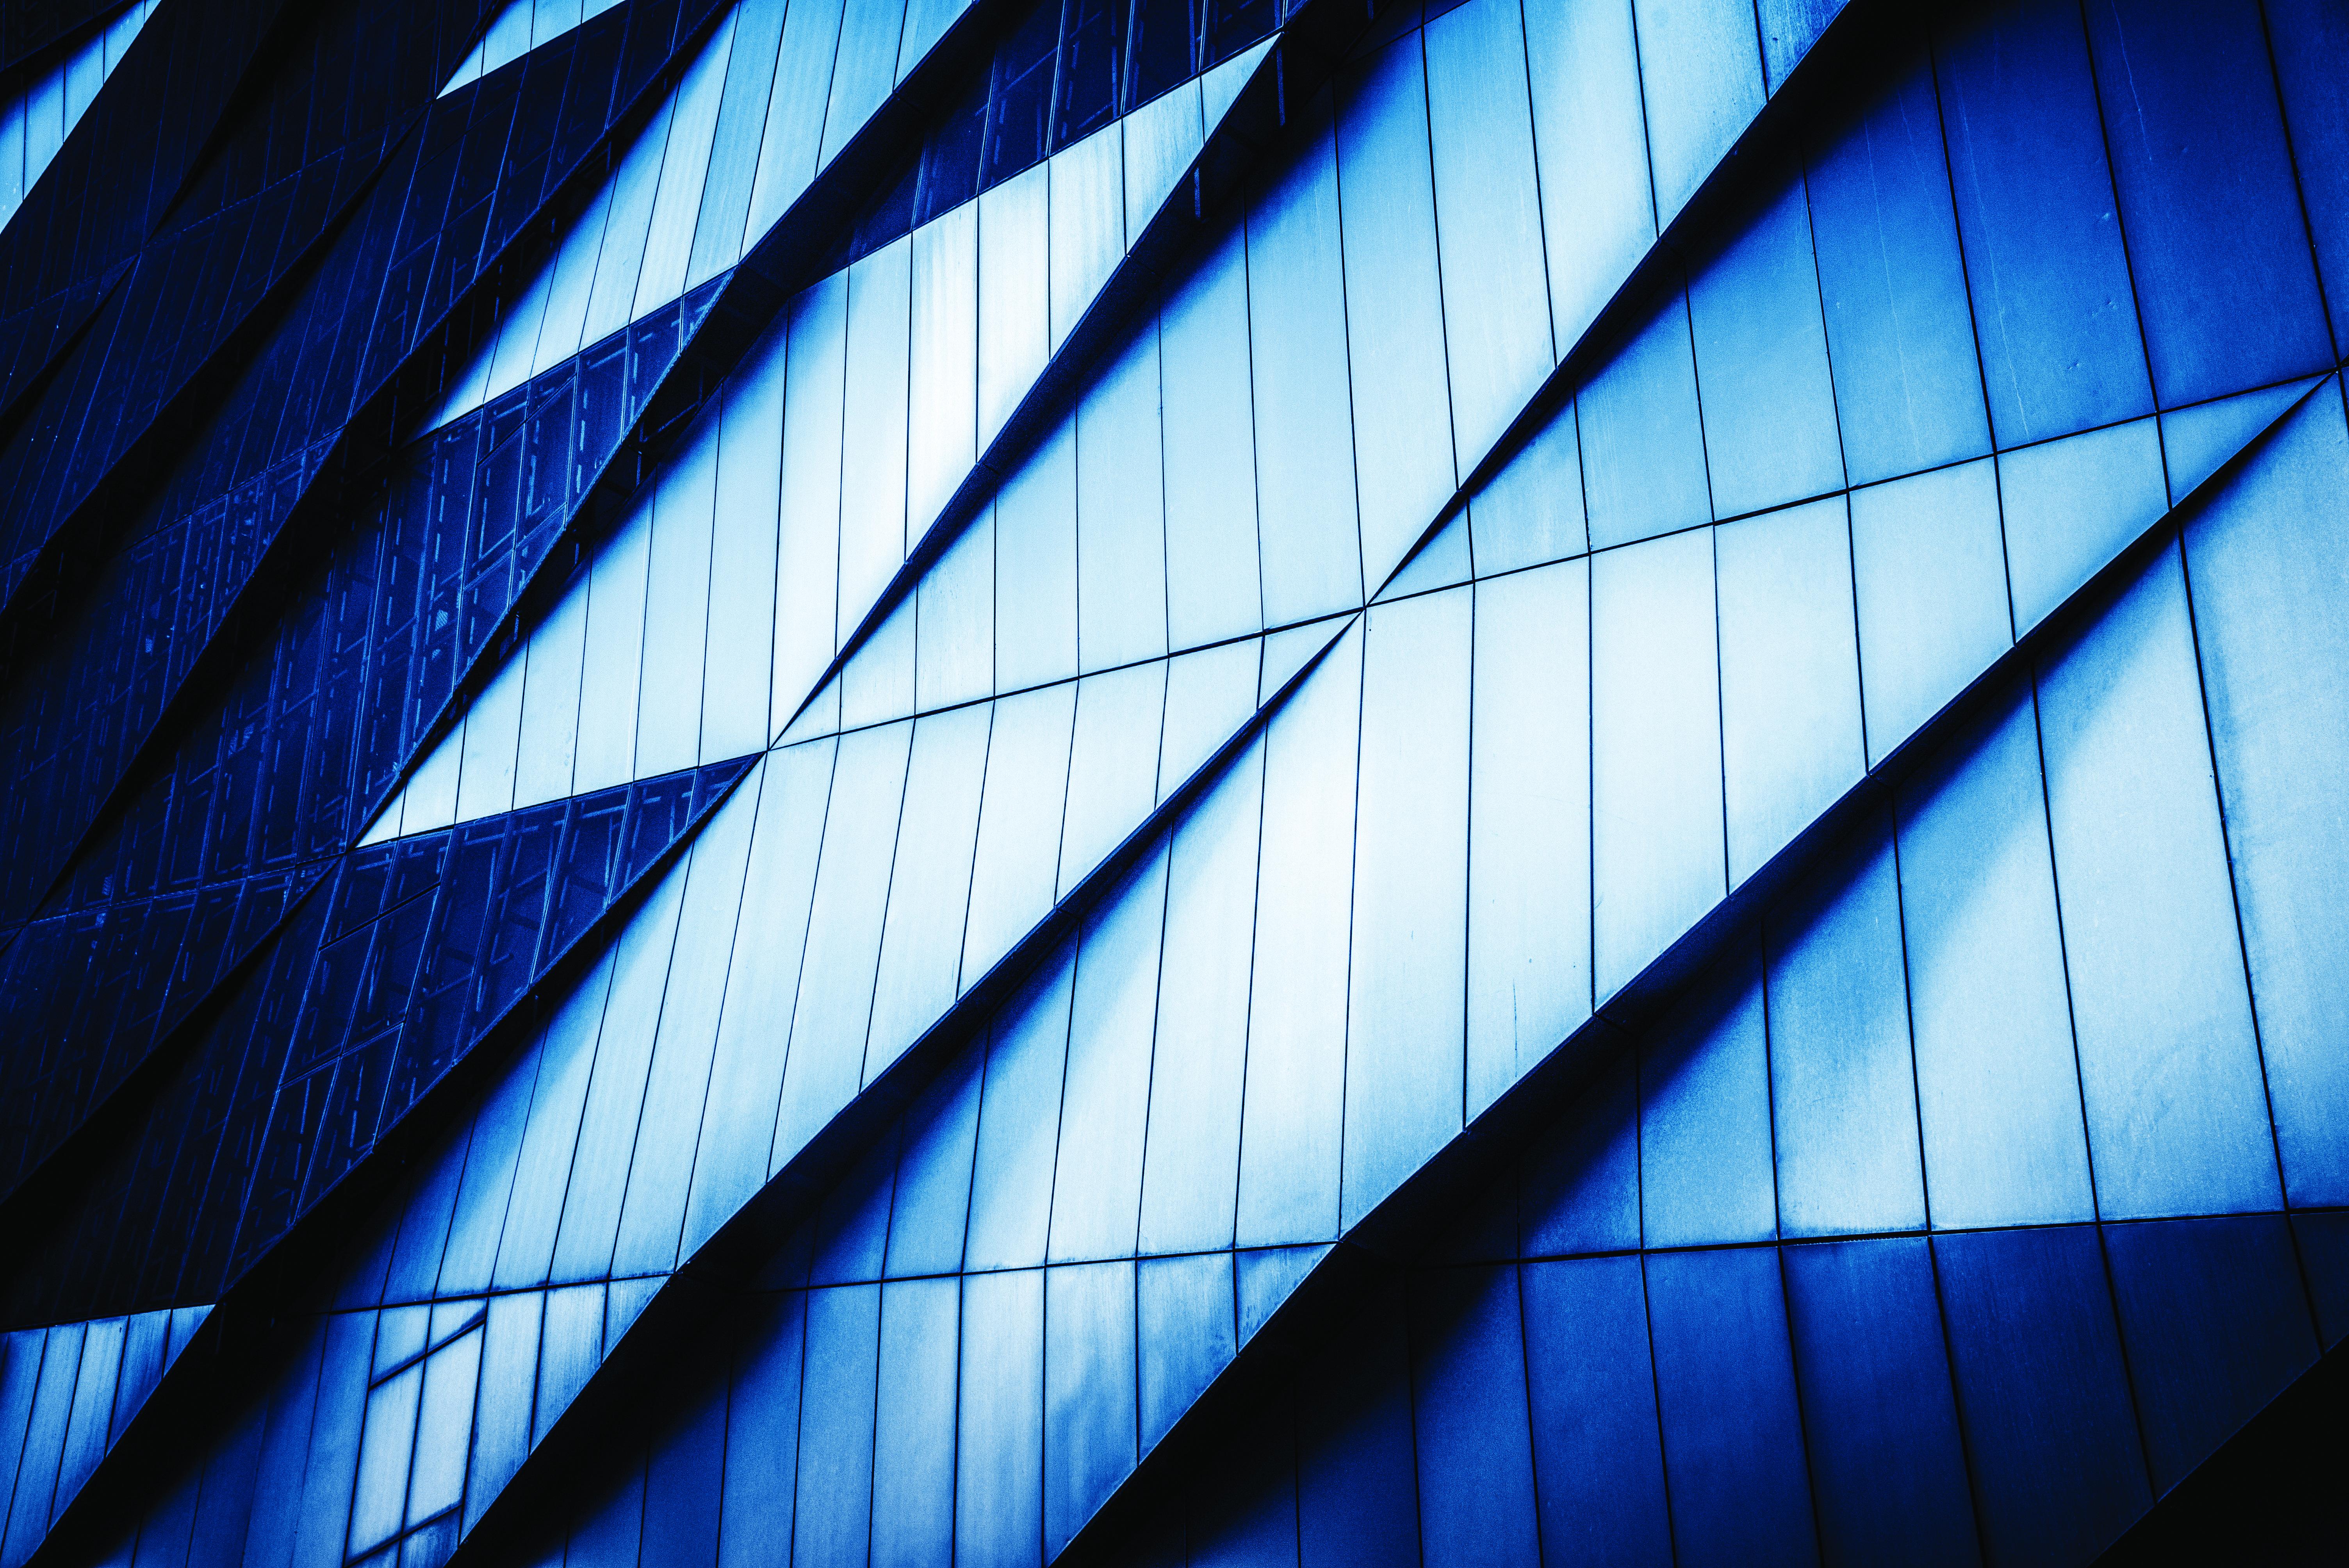 exterior view of building windows